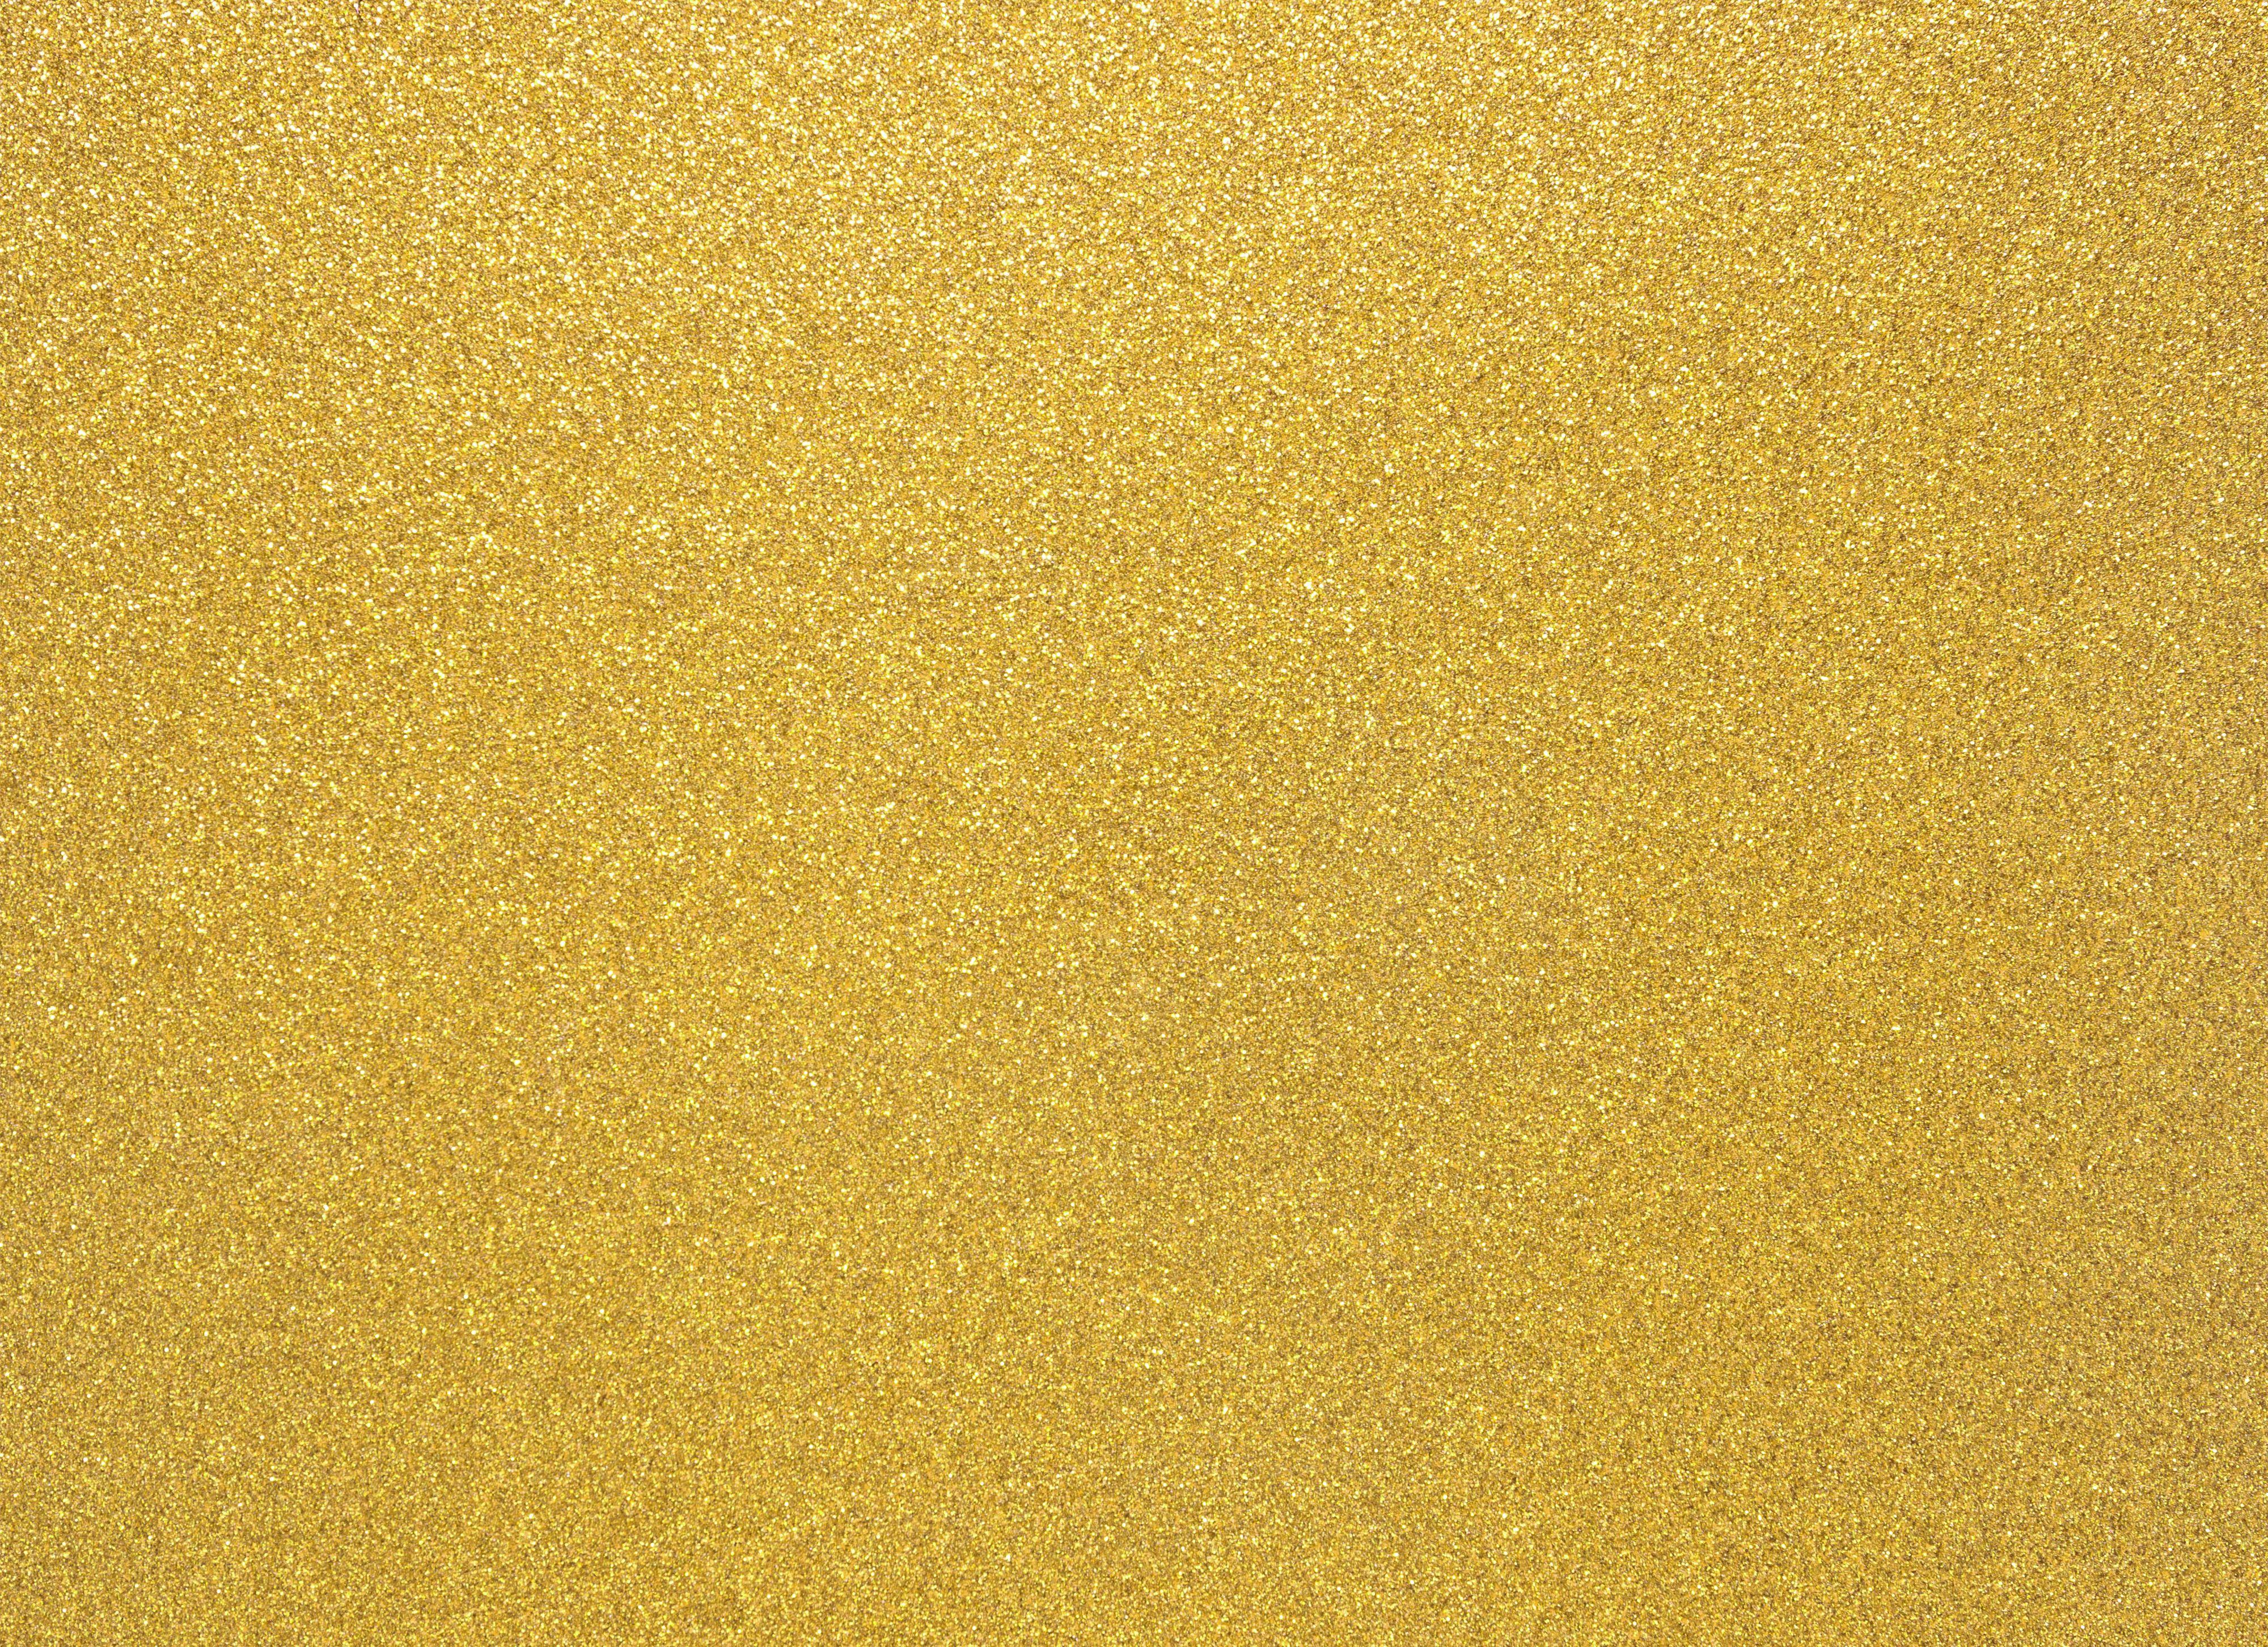 Gold Glitter Backgrounds - Wallpaper Cave